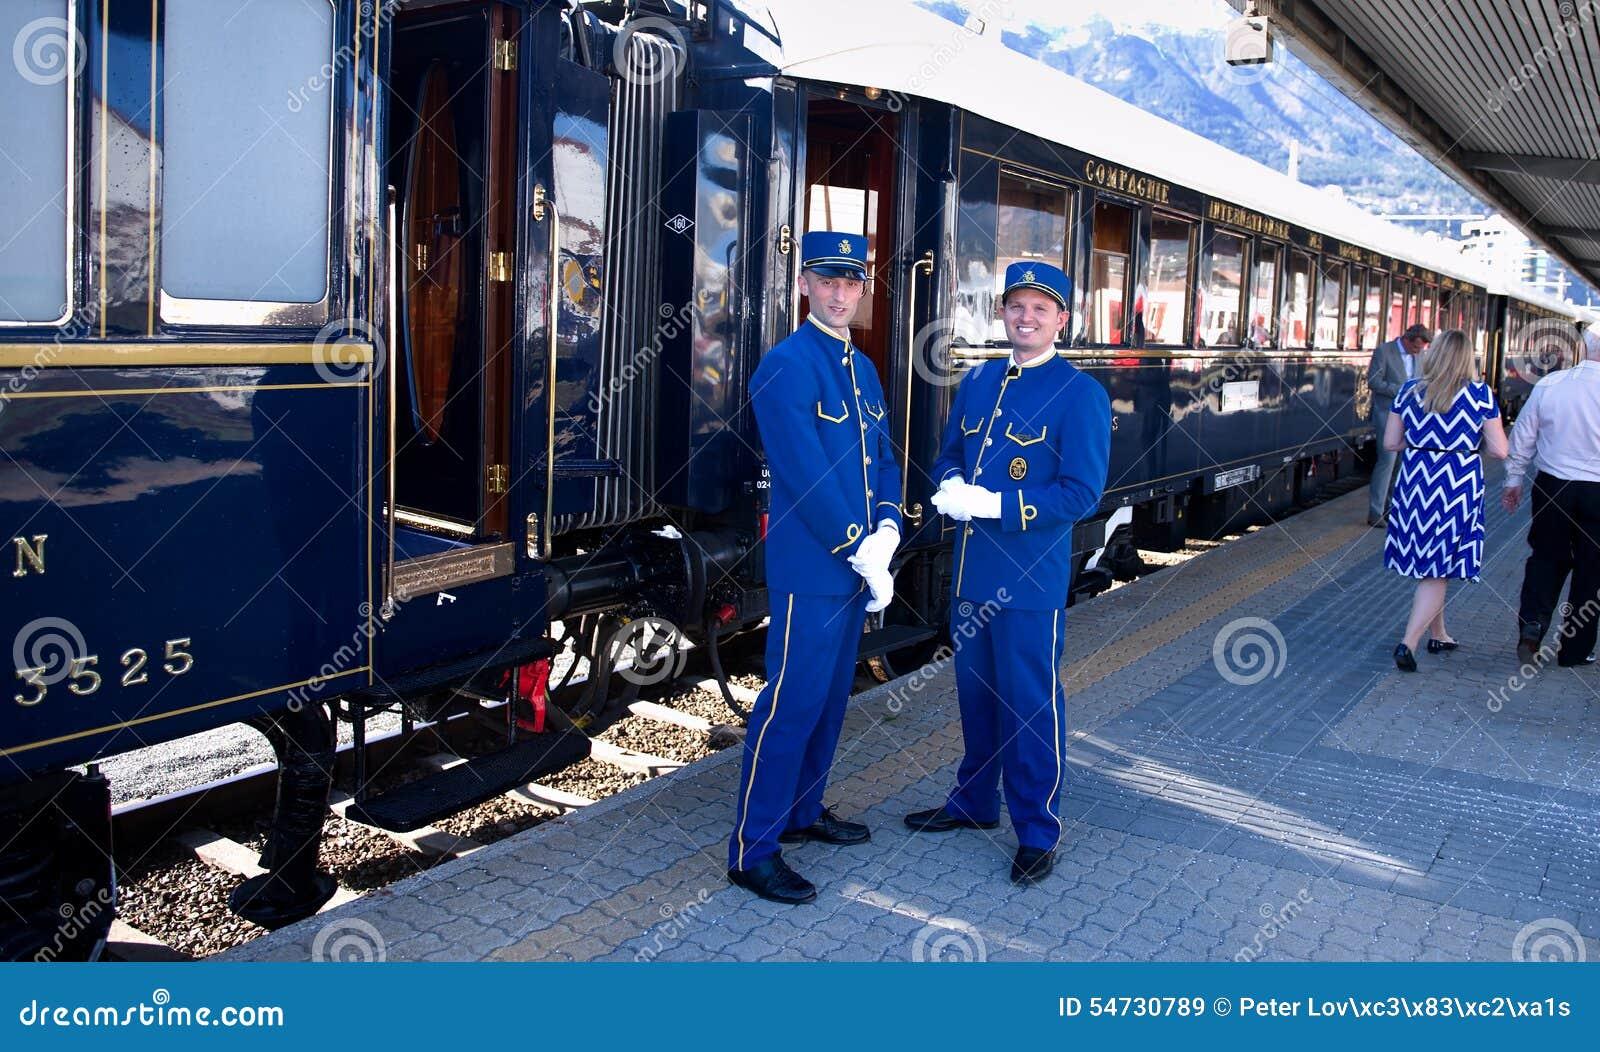 The Venice Simplon-Orient-Express - Conductors